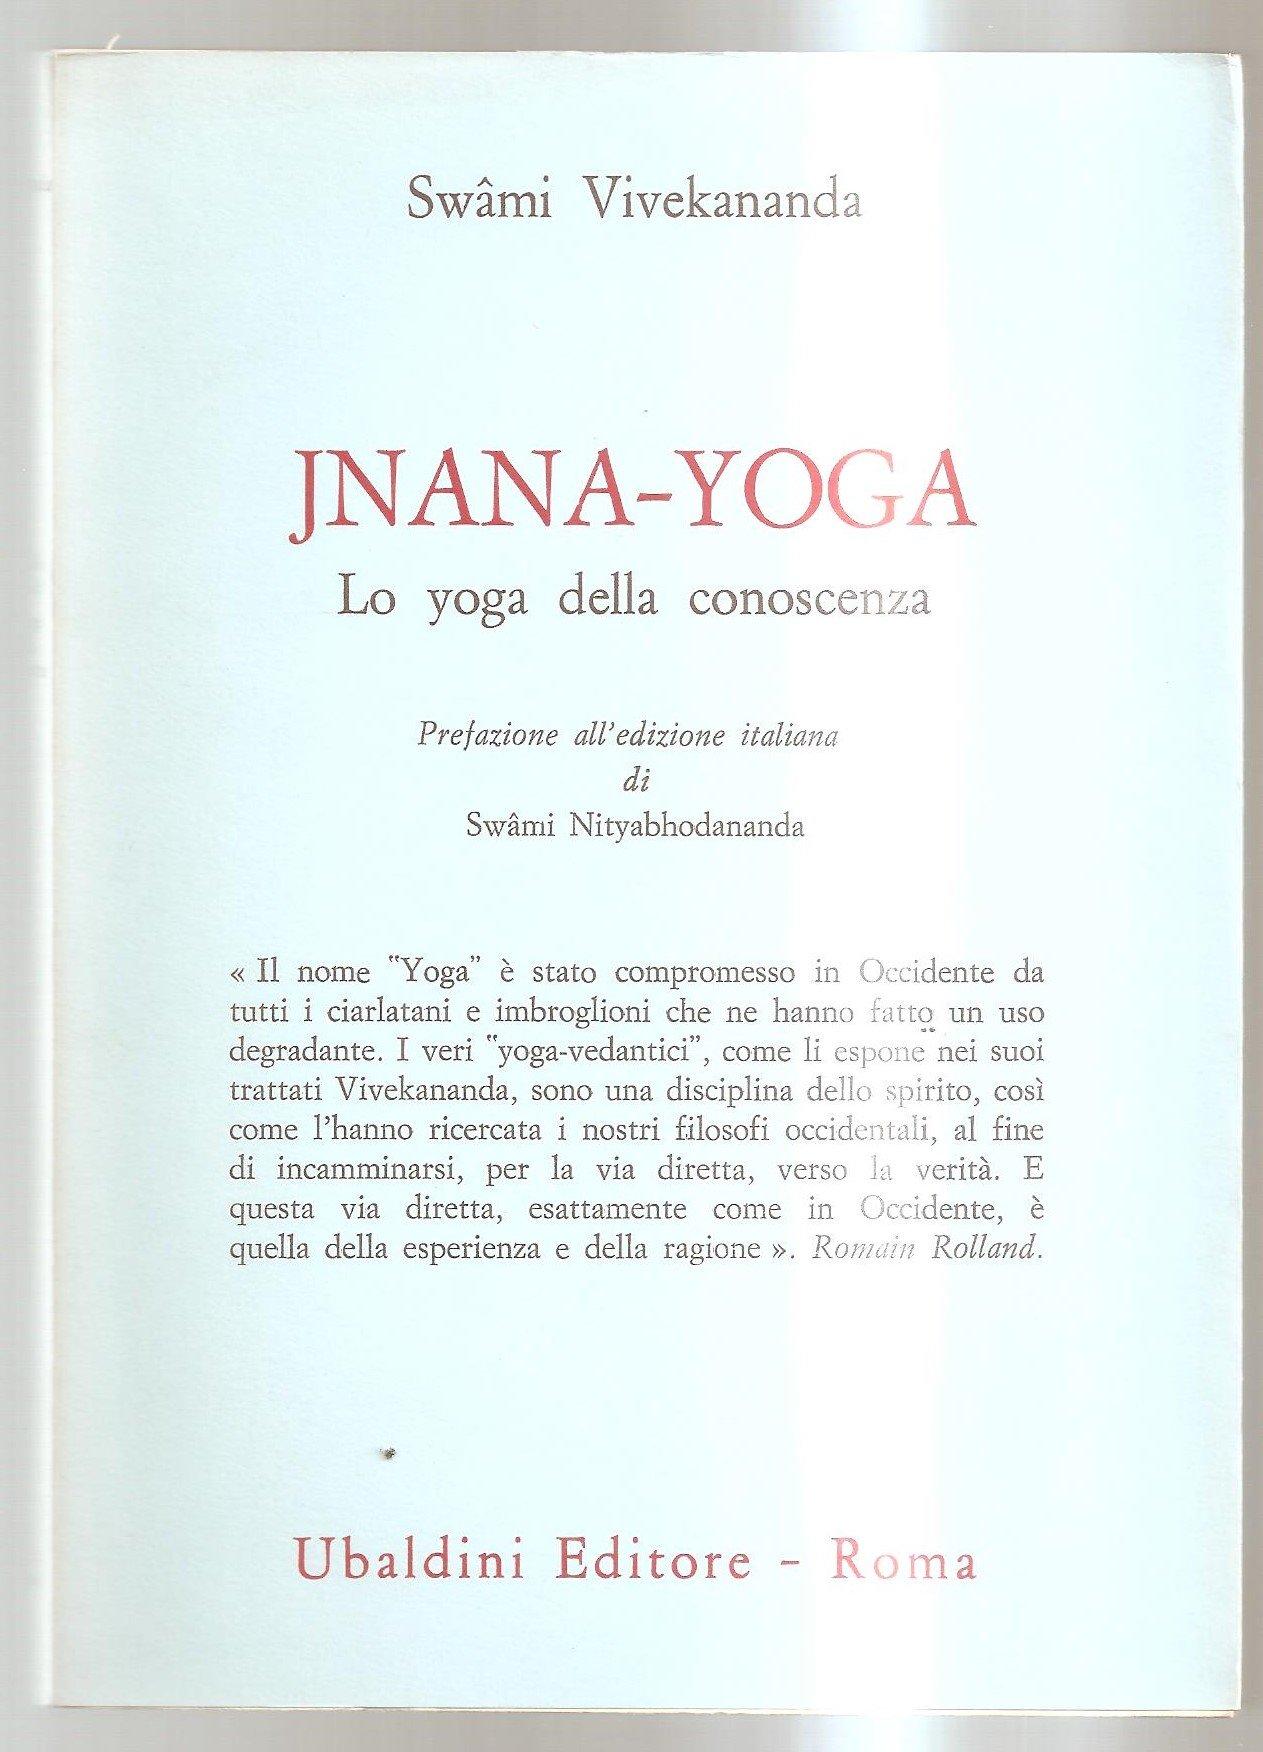 Jnana-yoga : Lo Yoga della conoscenza: Amazon.es ...